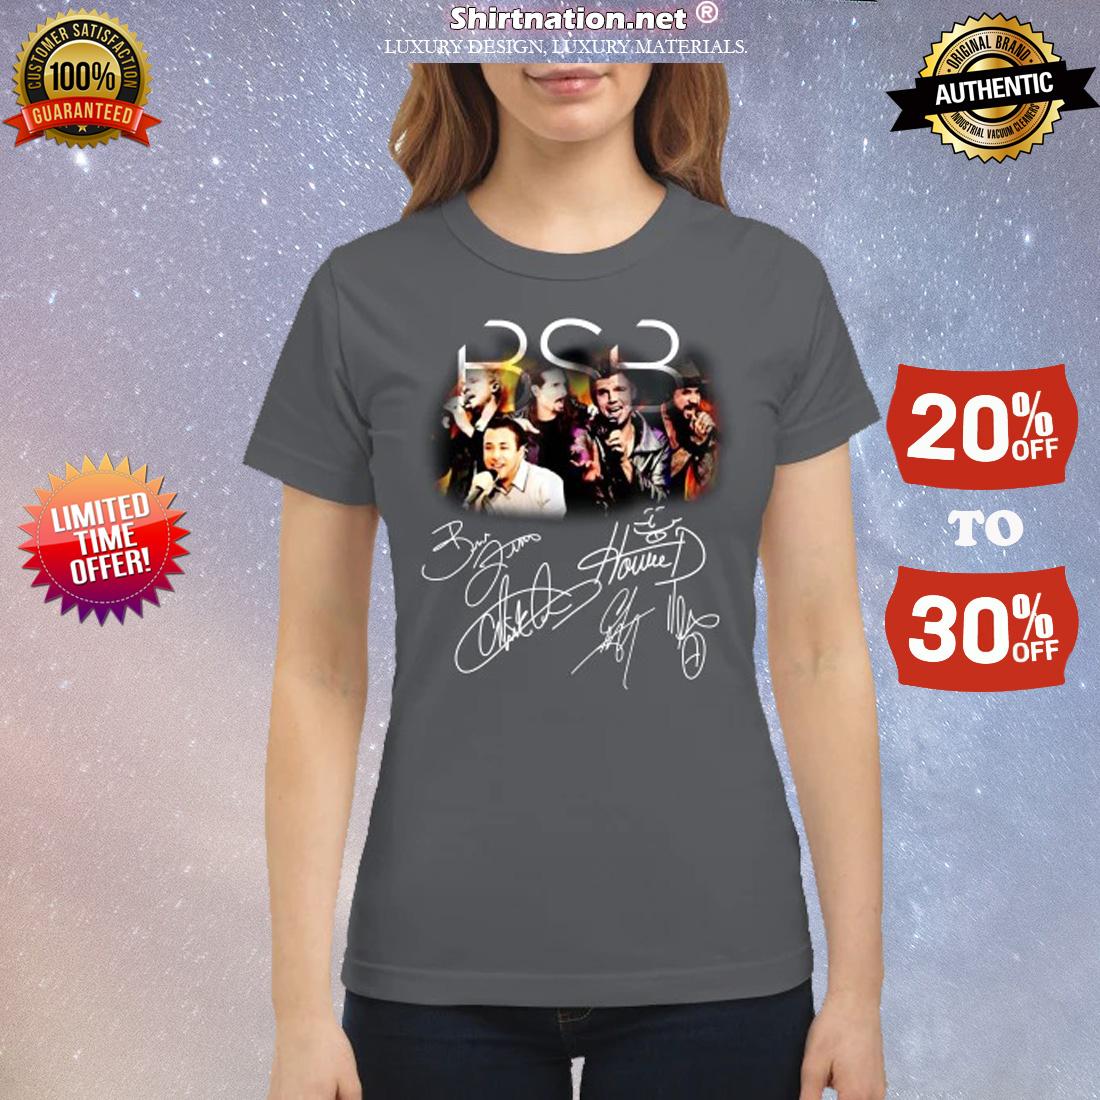 BSB backstreet boys members signatures classic shirt